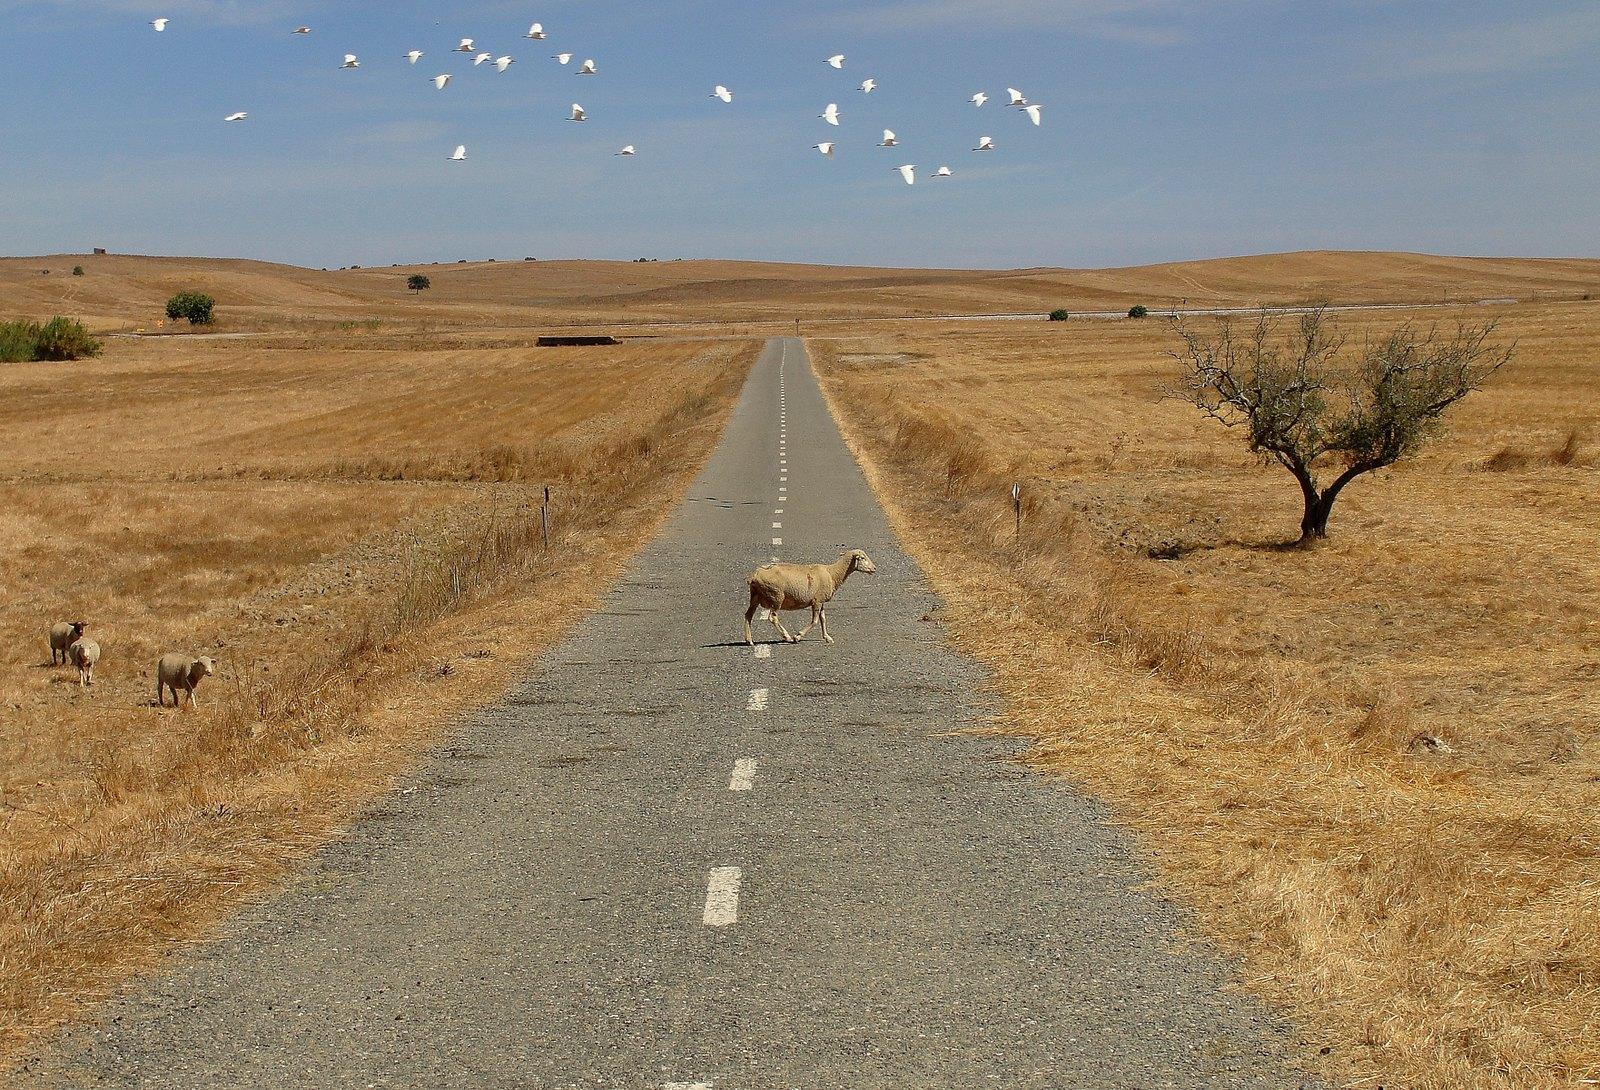 «A Estrada para o Fim do Mundo», Casével (Marteen van der Velden, 2010)